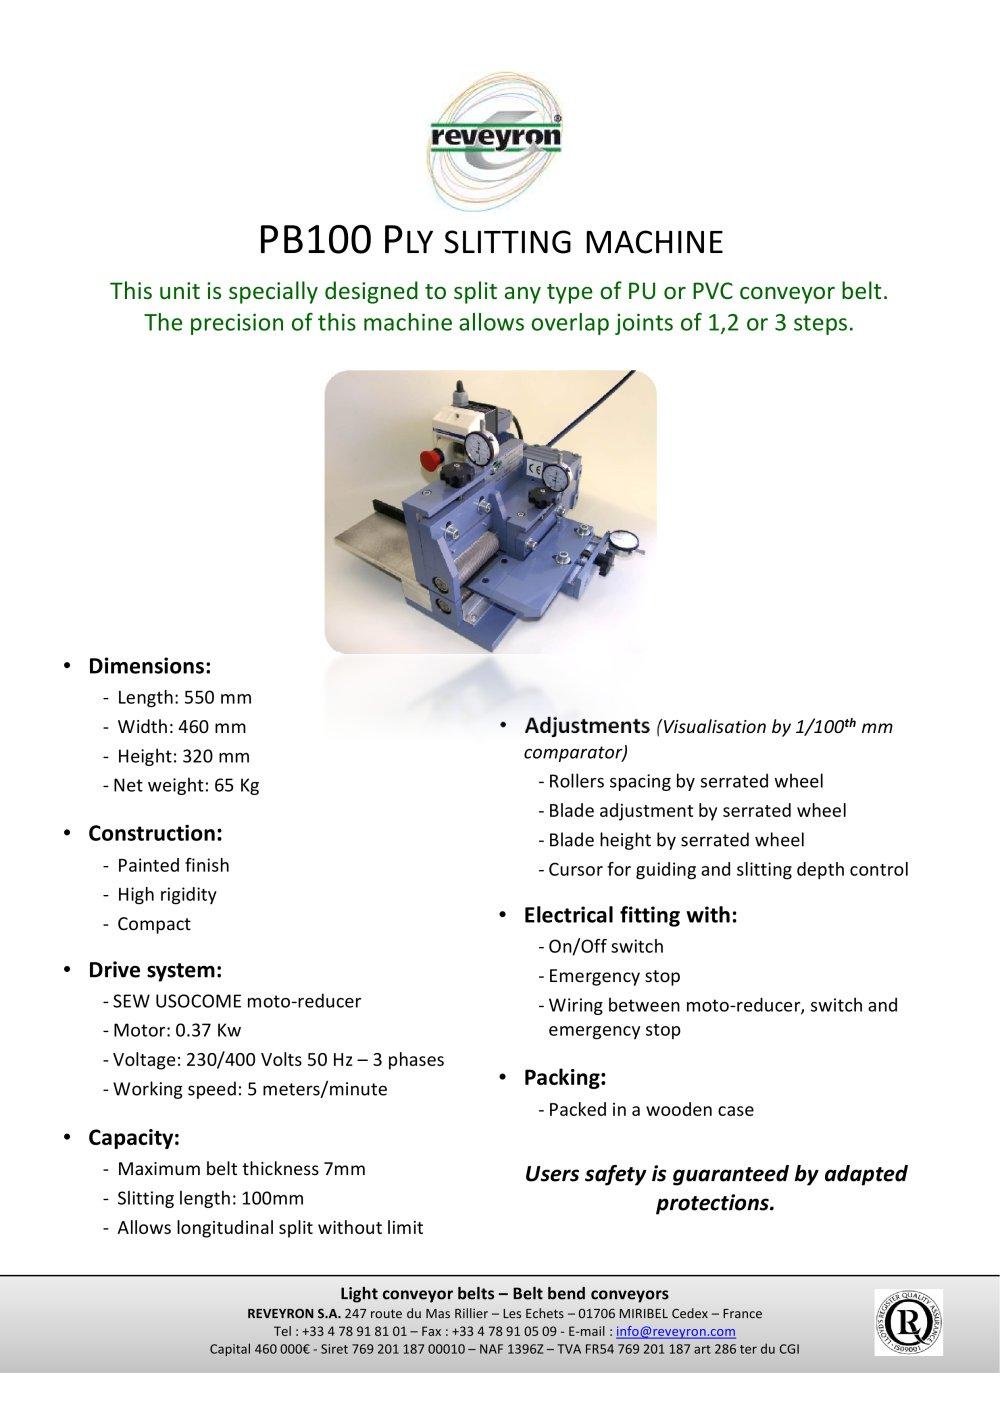 Ply Slitter Pb100 Reveyron Pdf Catalogue Technical Conveyor Belt Wiring Diagram 1 Pages